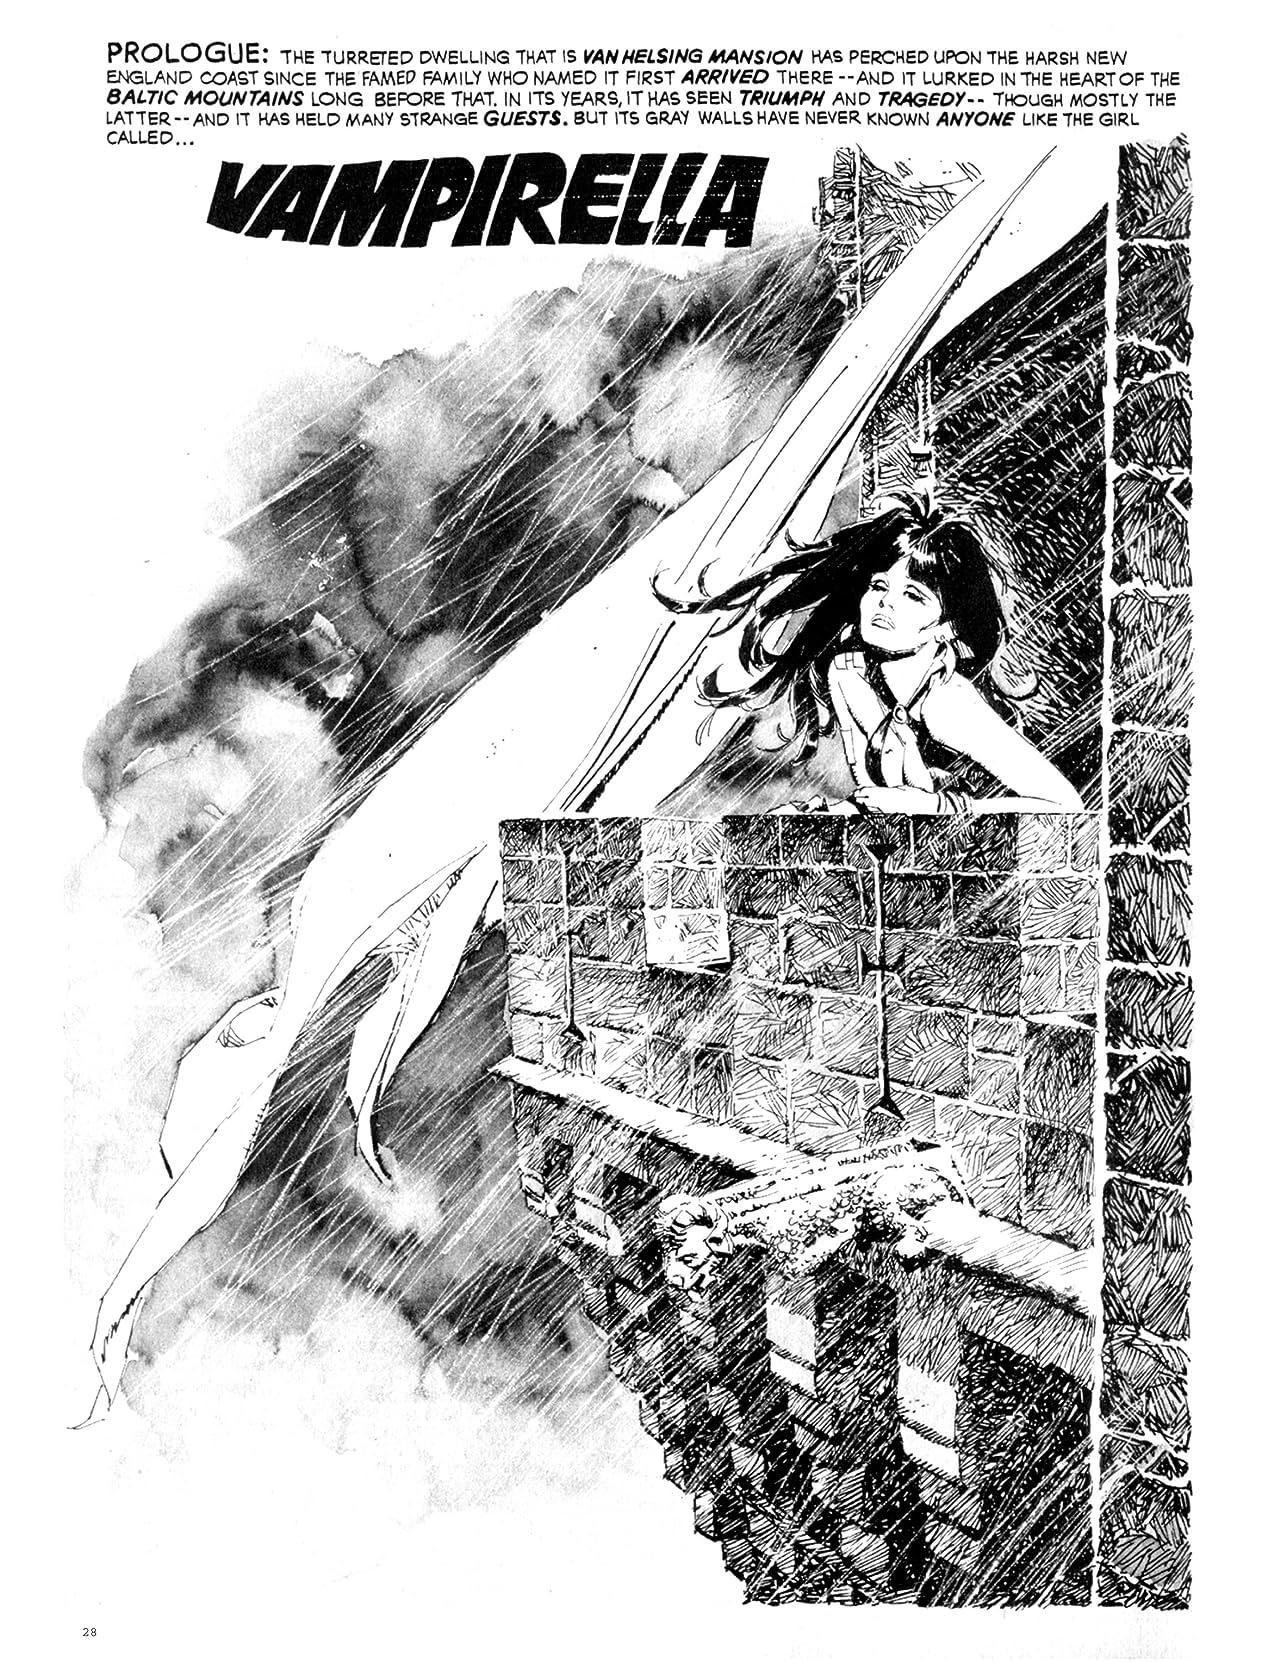 Vampirella (Magazine 1969-1983) #22